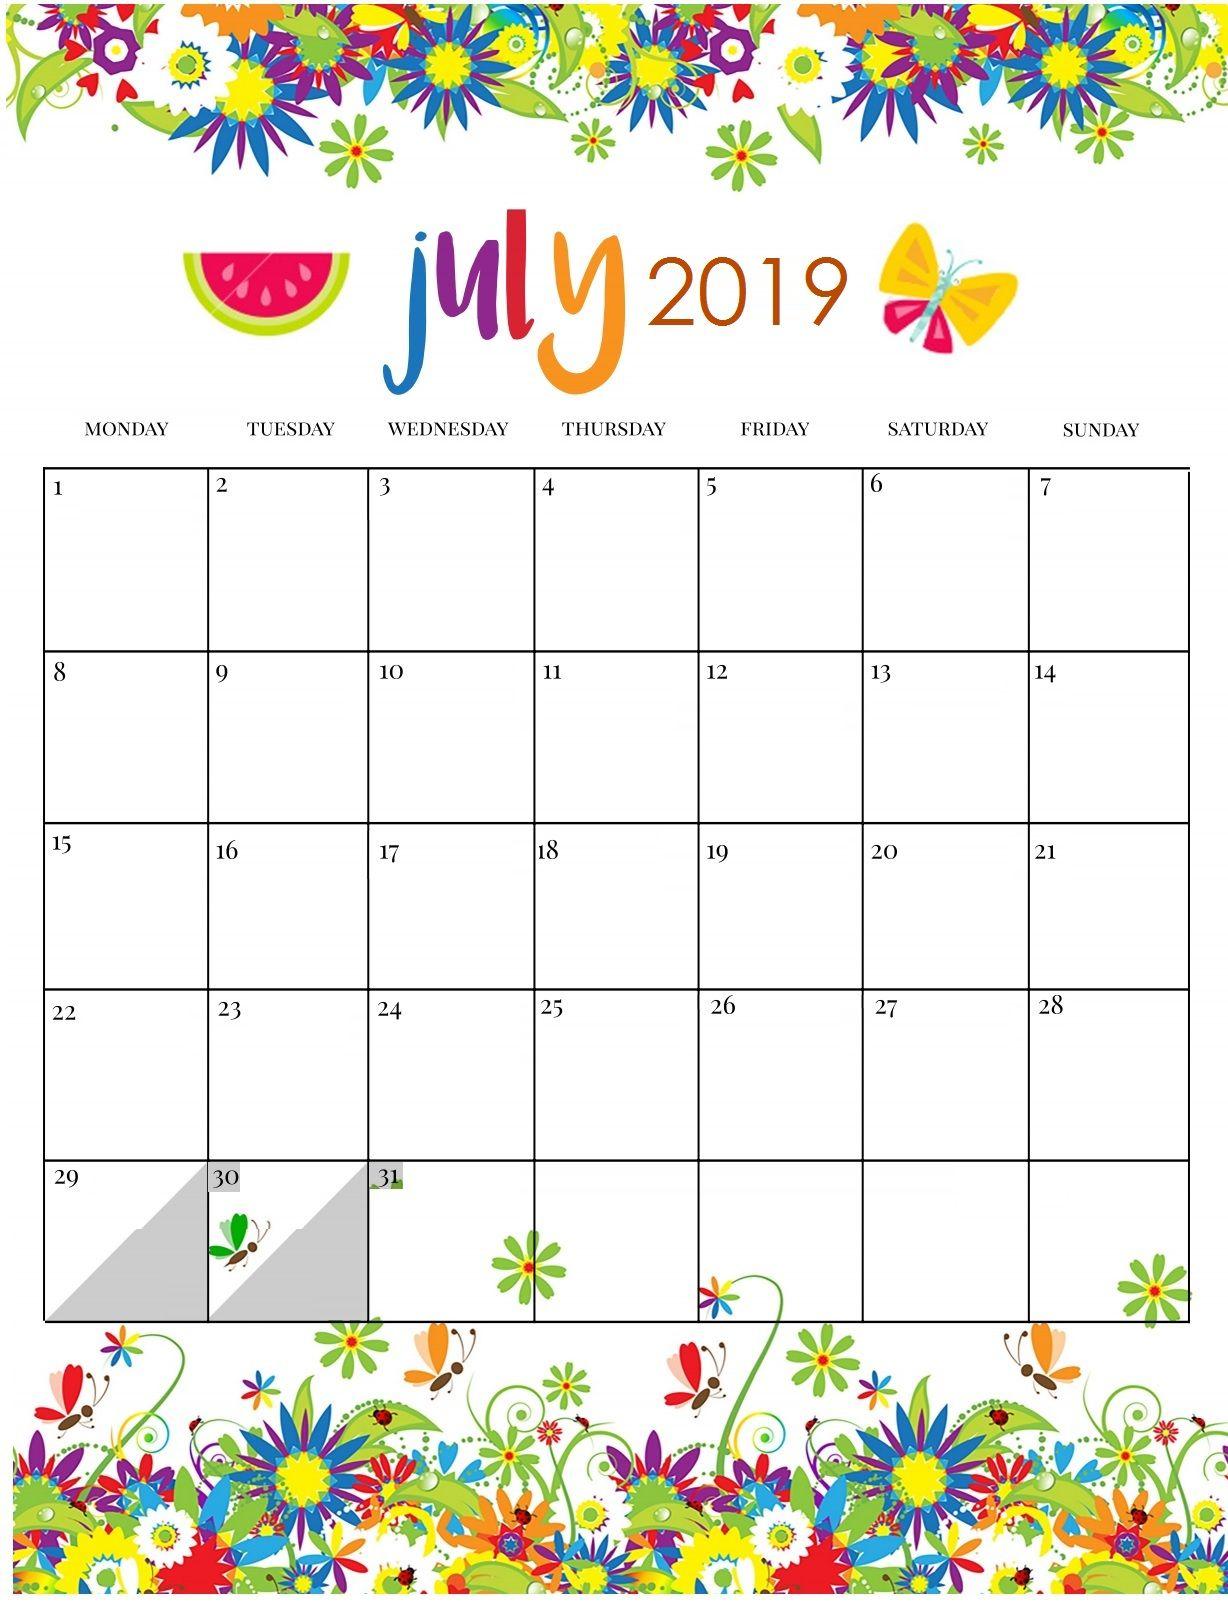 Cute July 2019 Calendar Pink Designs Floral Wall Calendar With